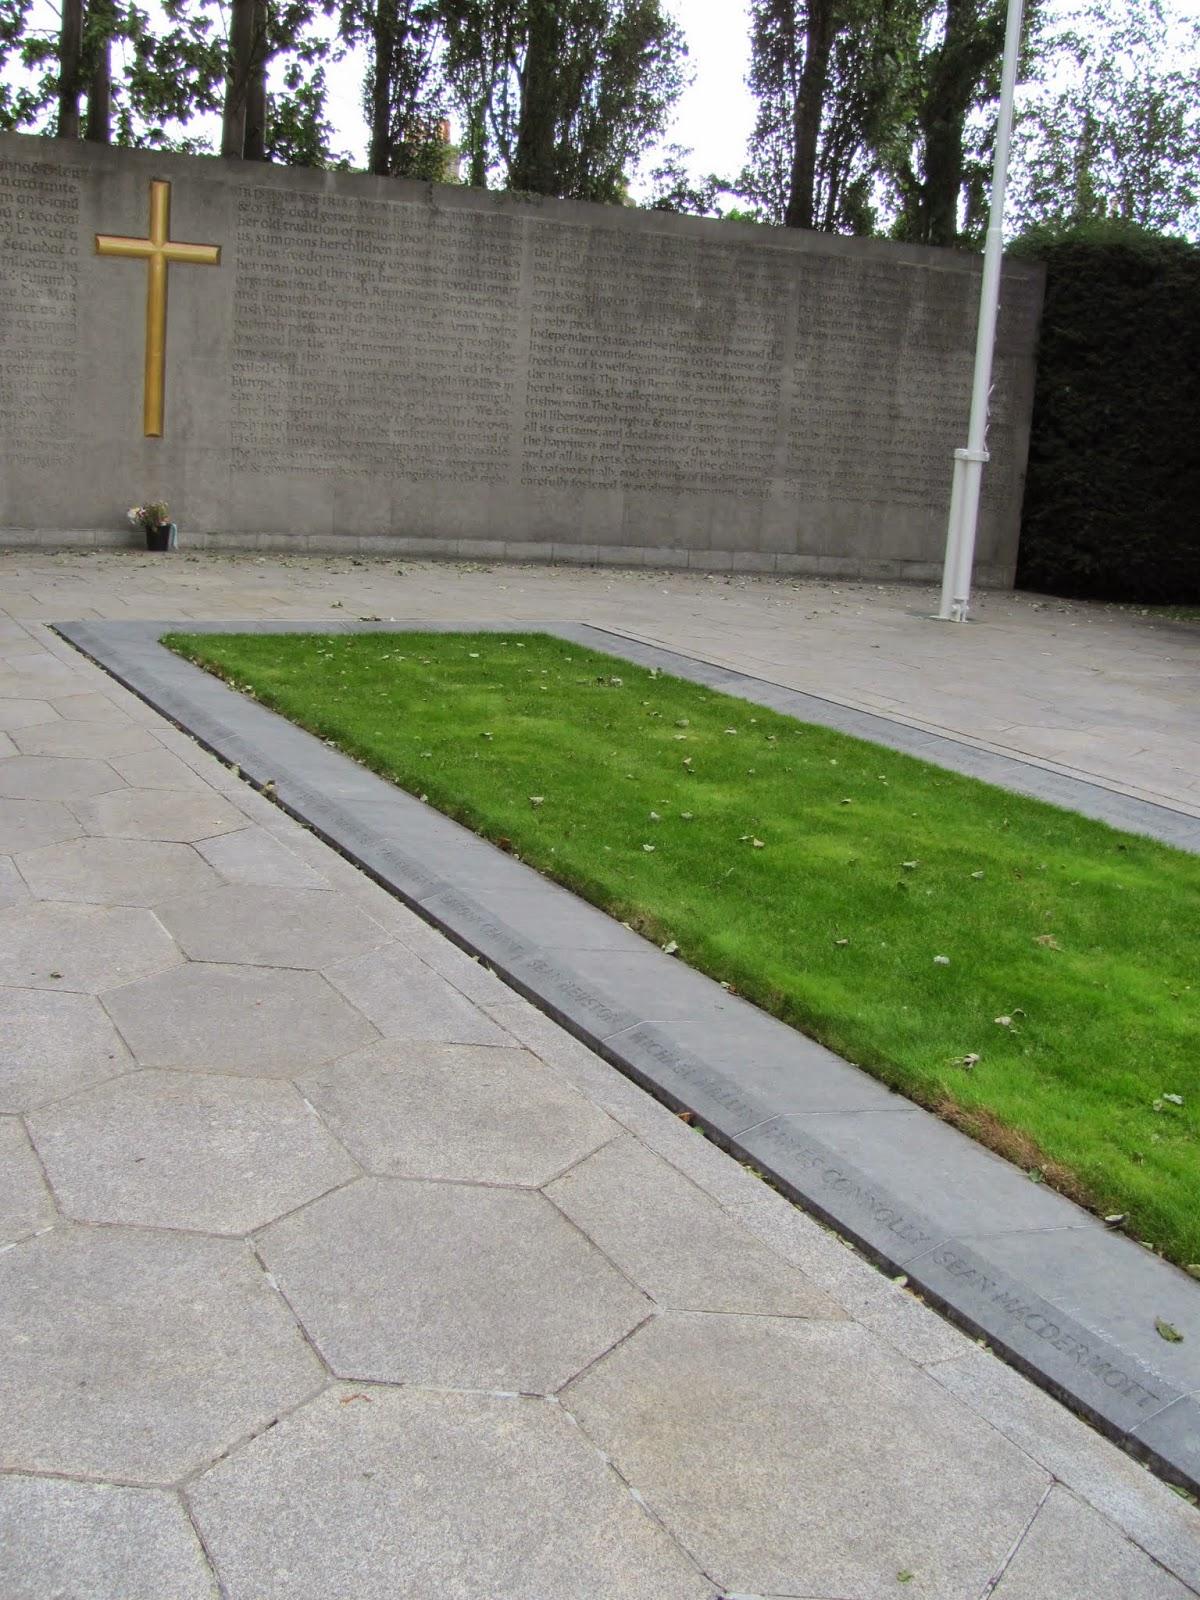 1916 Burials Arbour Hill Cemetery Dublin, Ireland